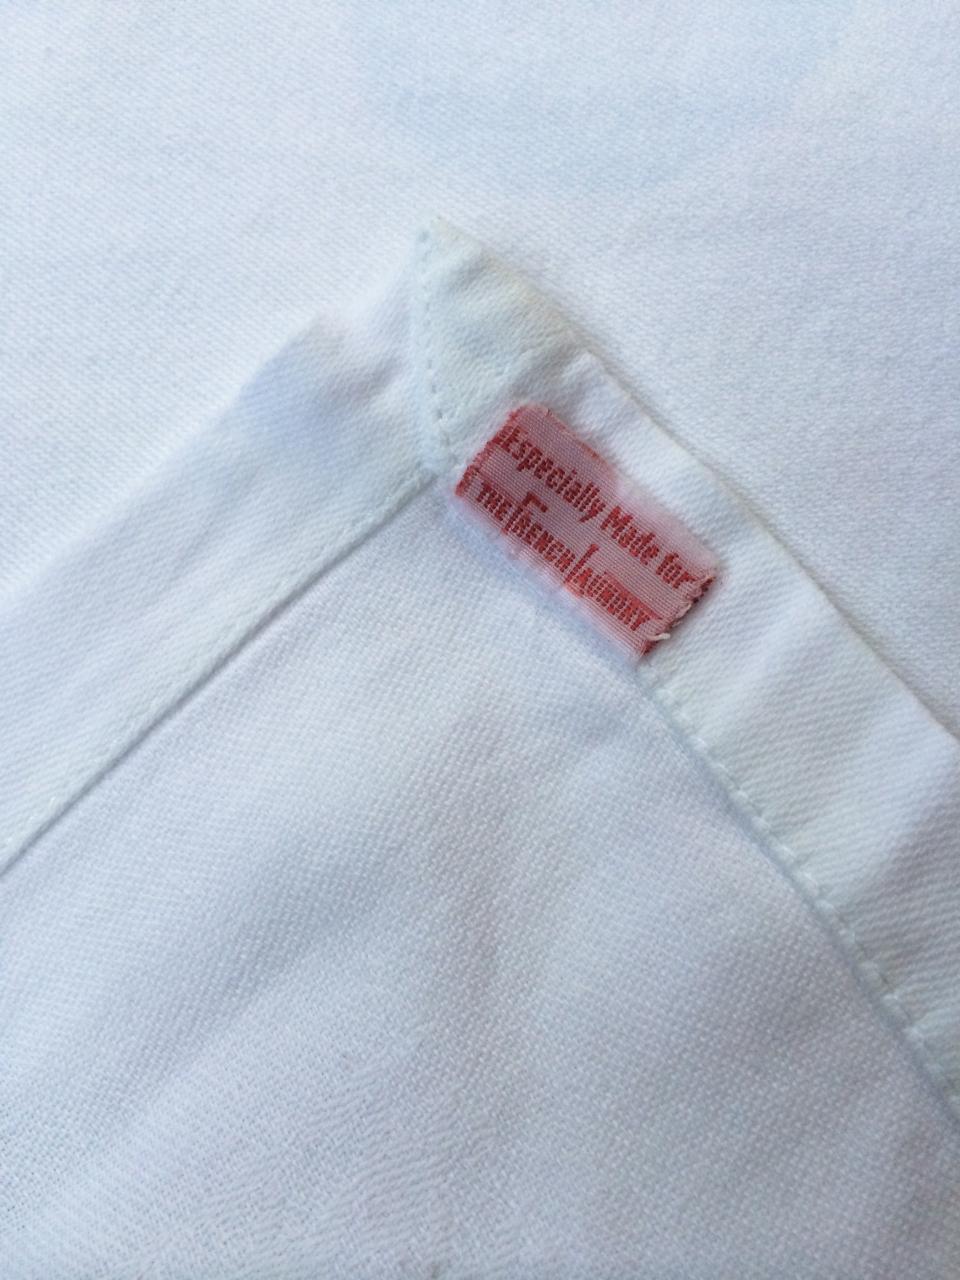 ^^ their napkins are even made special!! ^^